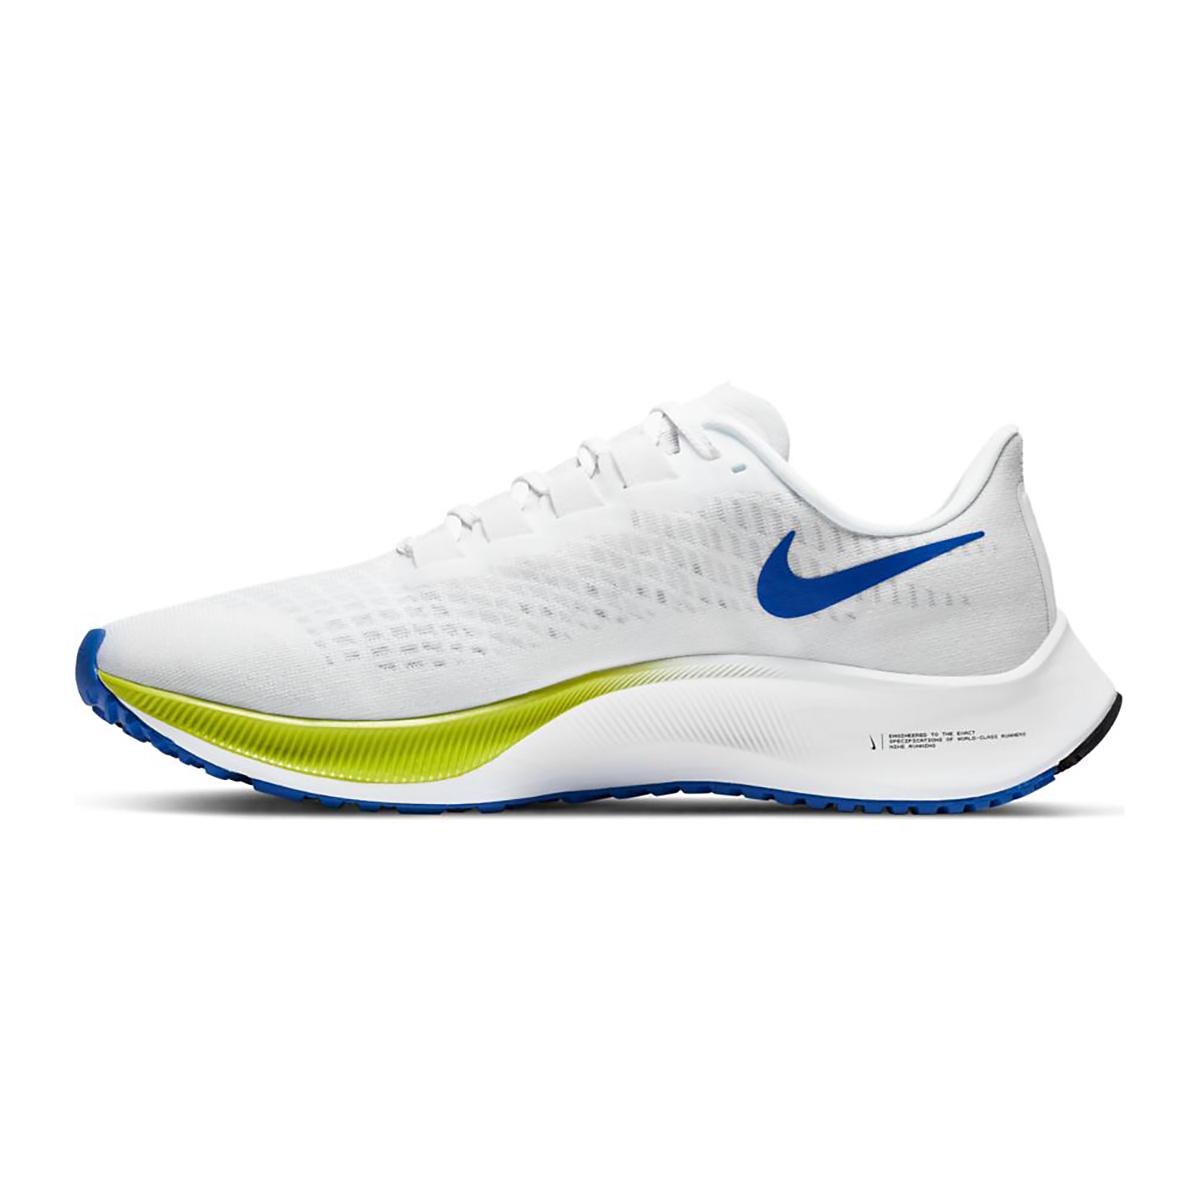 Men's Nike Nike Air Zoom Pegasus 37 Running Shoe - Color: White/Racer Blue/Cyber/Black - Size: 6 - Width: Regular, White/Racer Blue/Cyber/Black, large, image 2